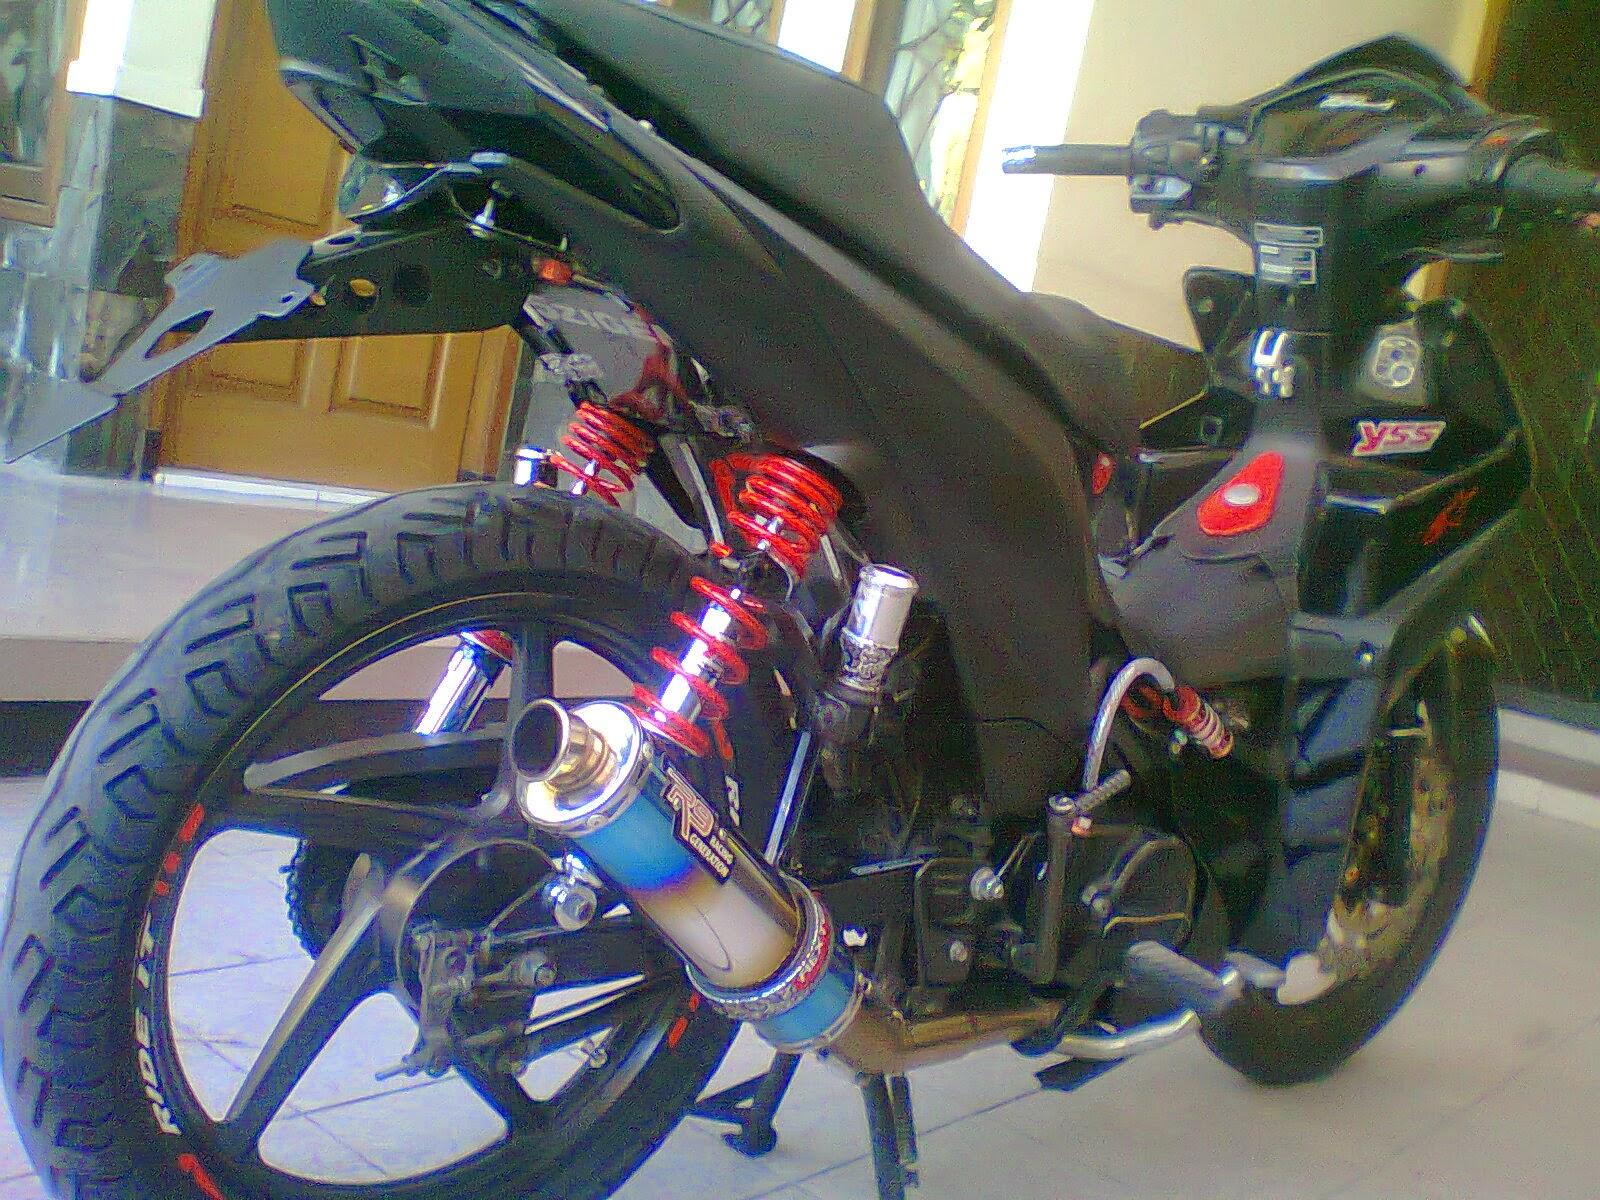 Koleksi Ide Modifikasi Motor Revo 110 Terlengkap Obeng Motor